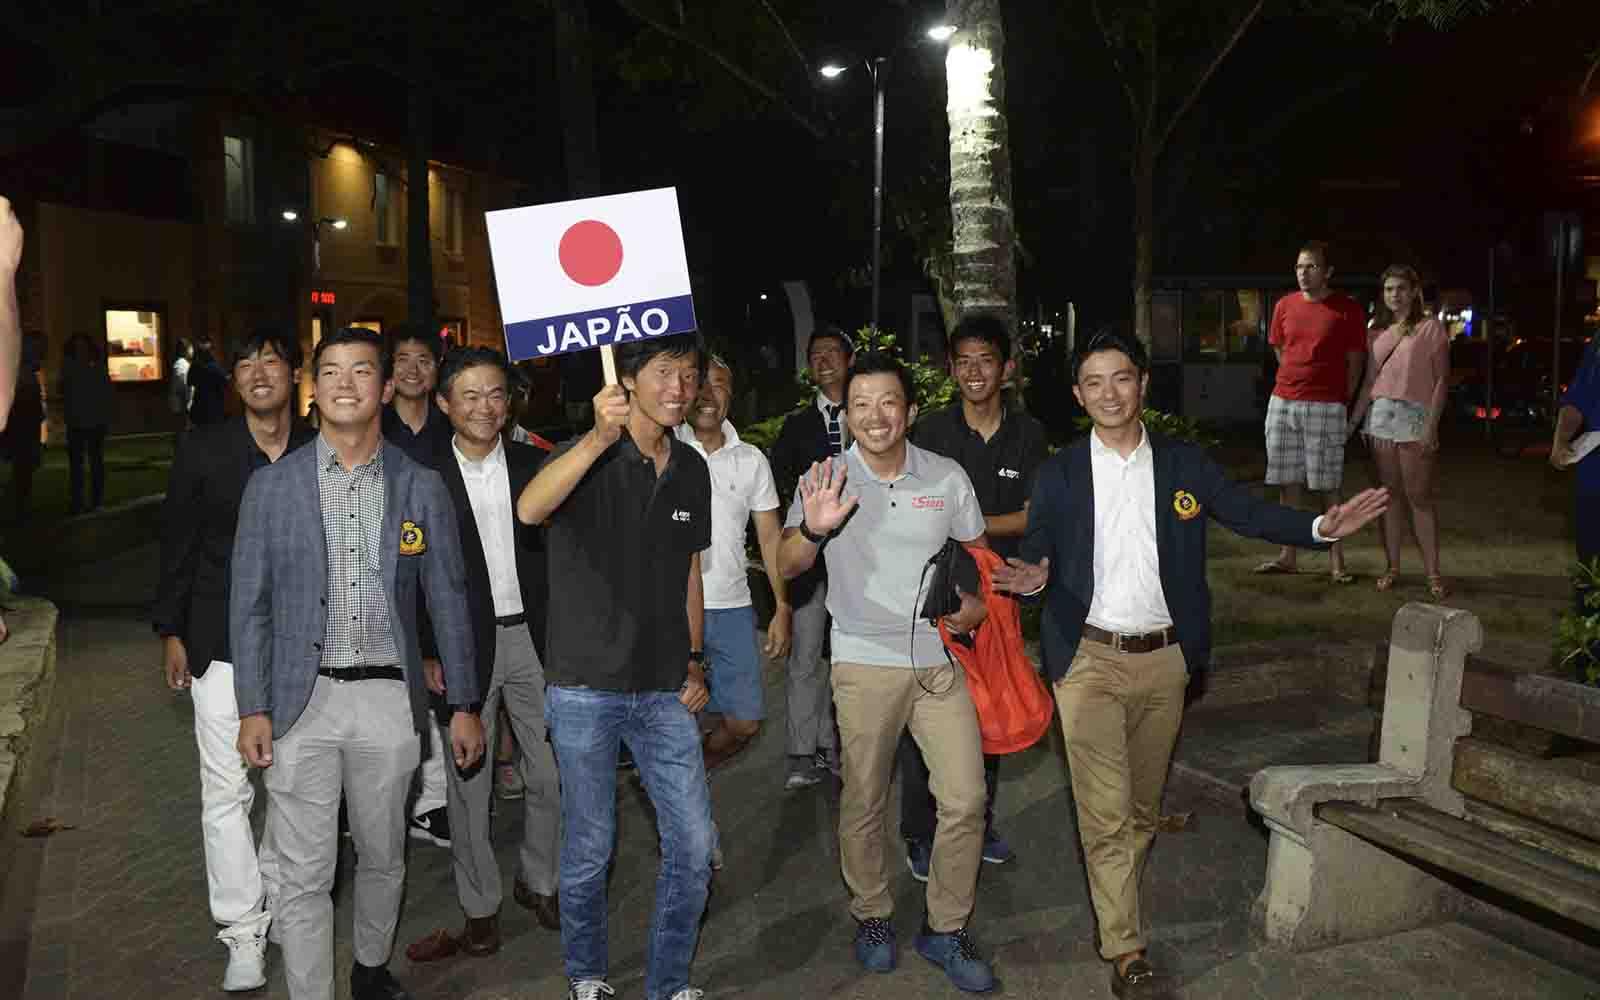 Japoneses (Ronald Kraag) Mundial de Snipe 2019 - boat shopping